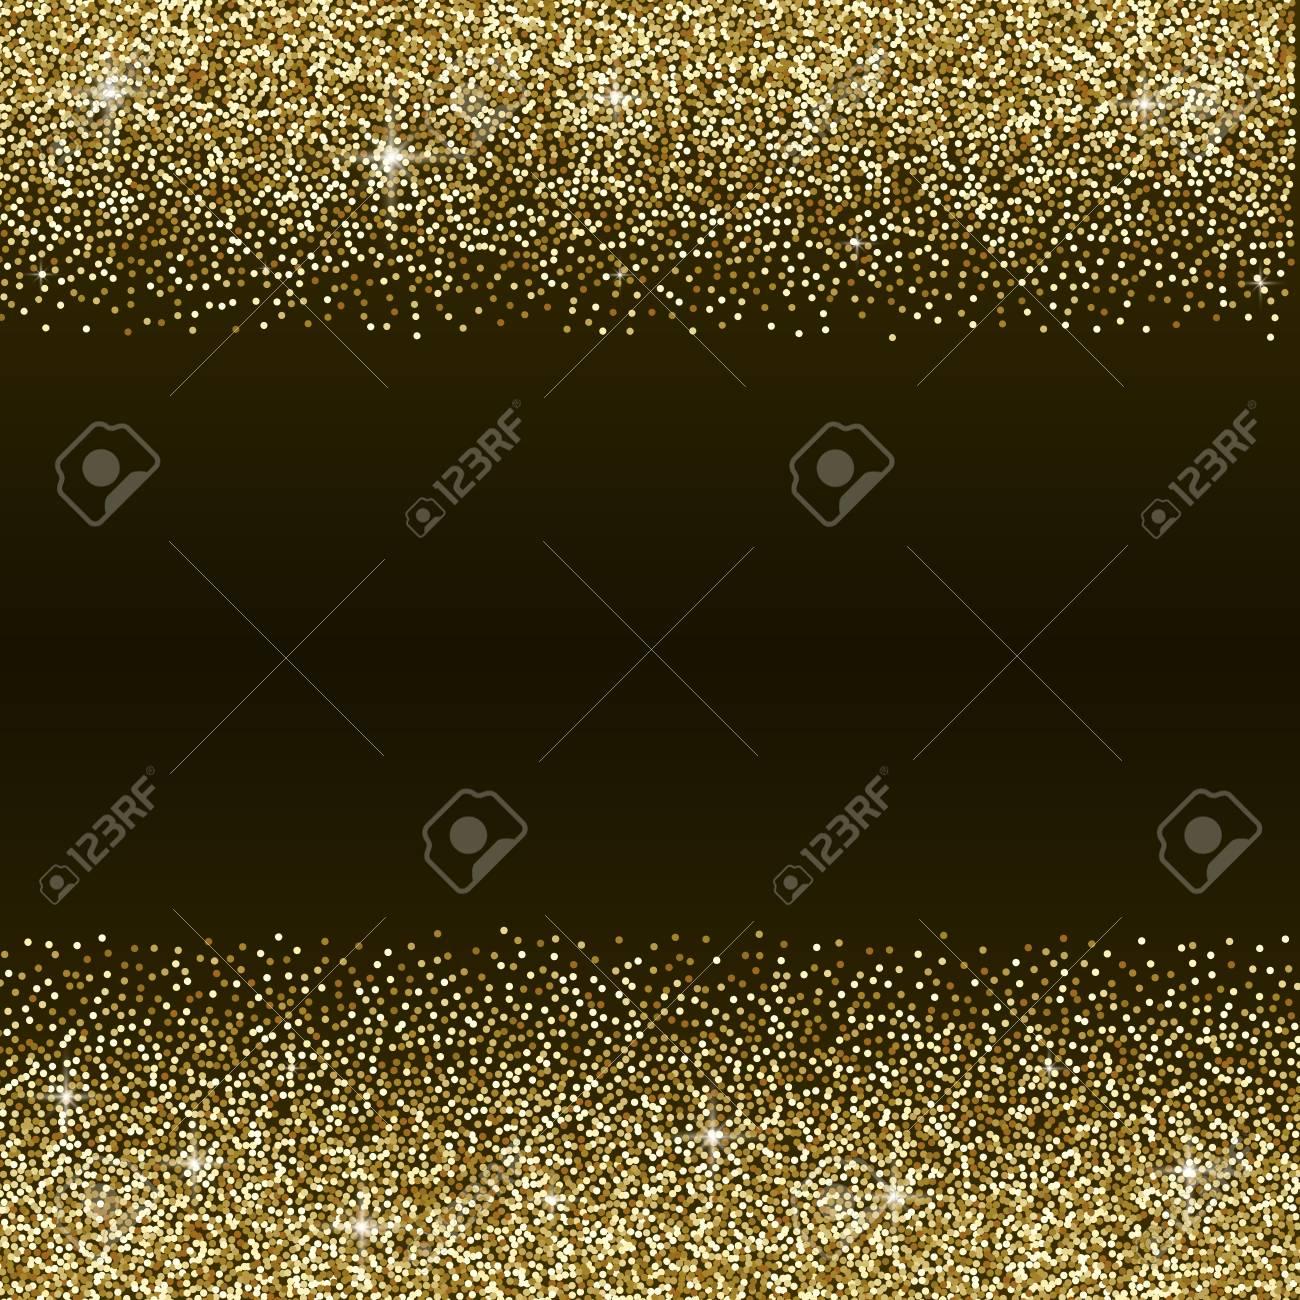 Gold Glitter Abstract Background Golden Sparkles On Black Background